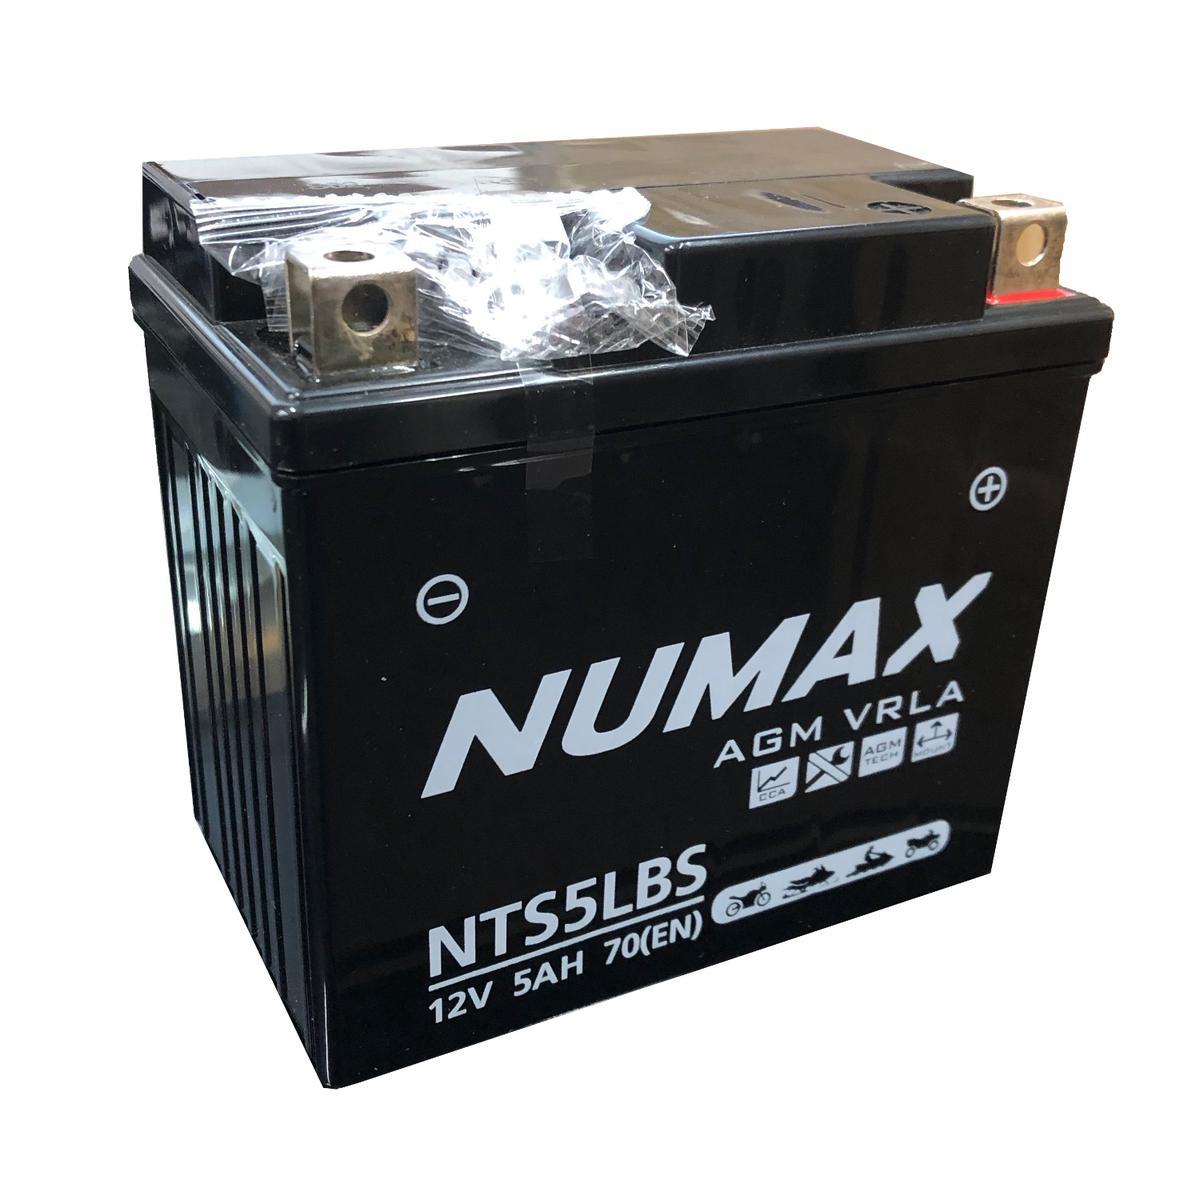 Numax 12v NTS5LBS Motorbike Bike Battery YAMAHA 50cc YW50A YTX5L-4